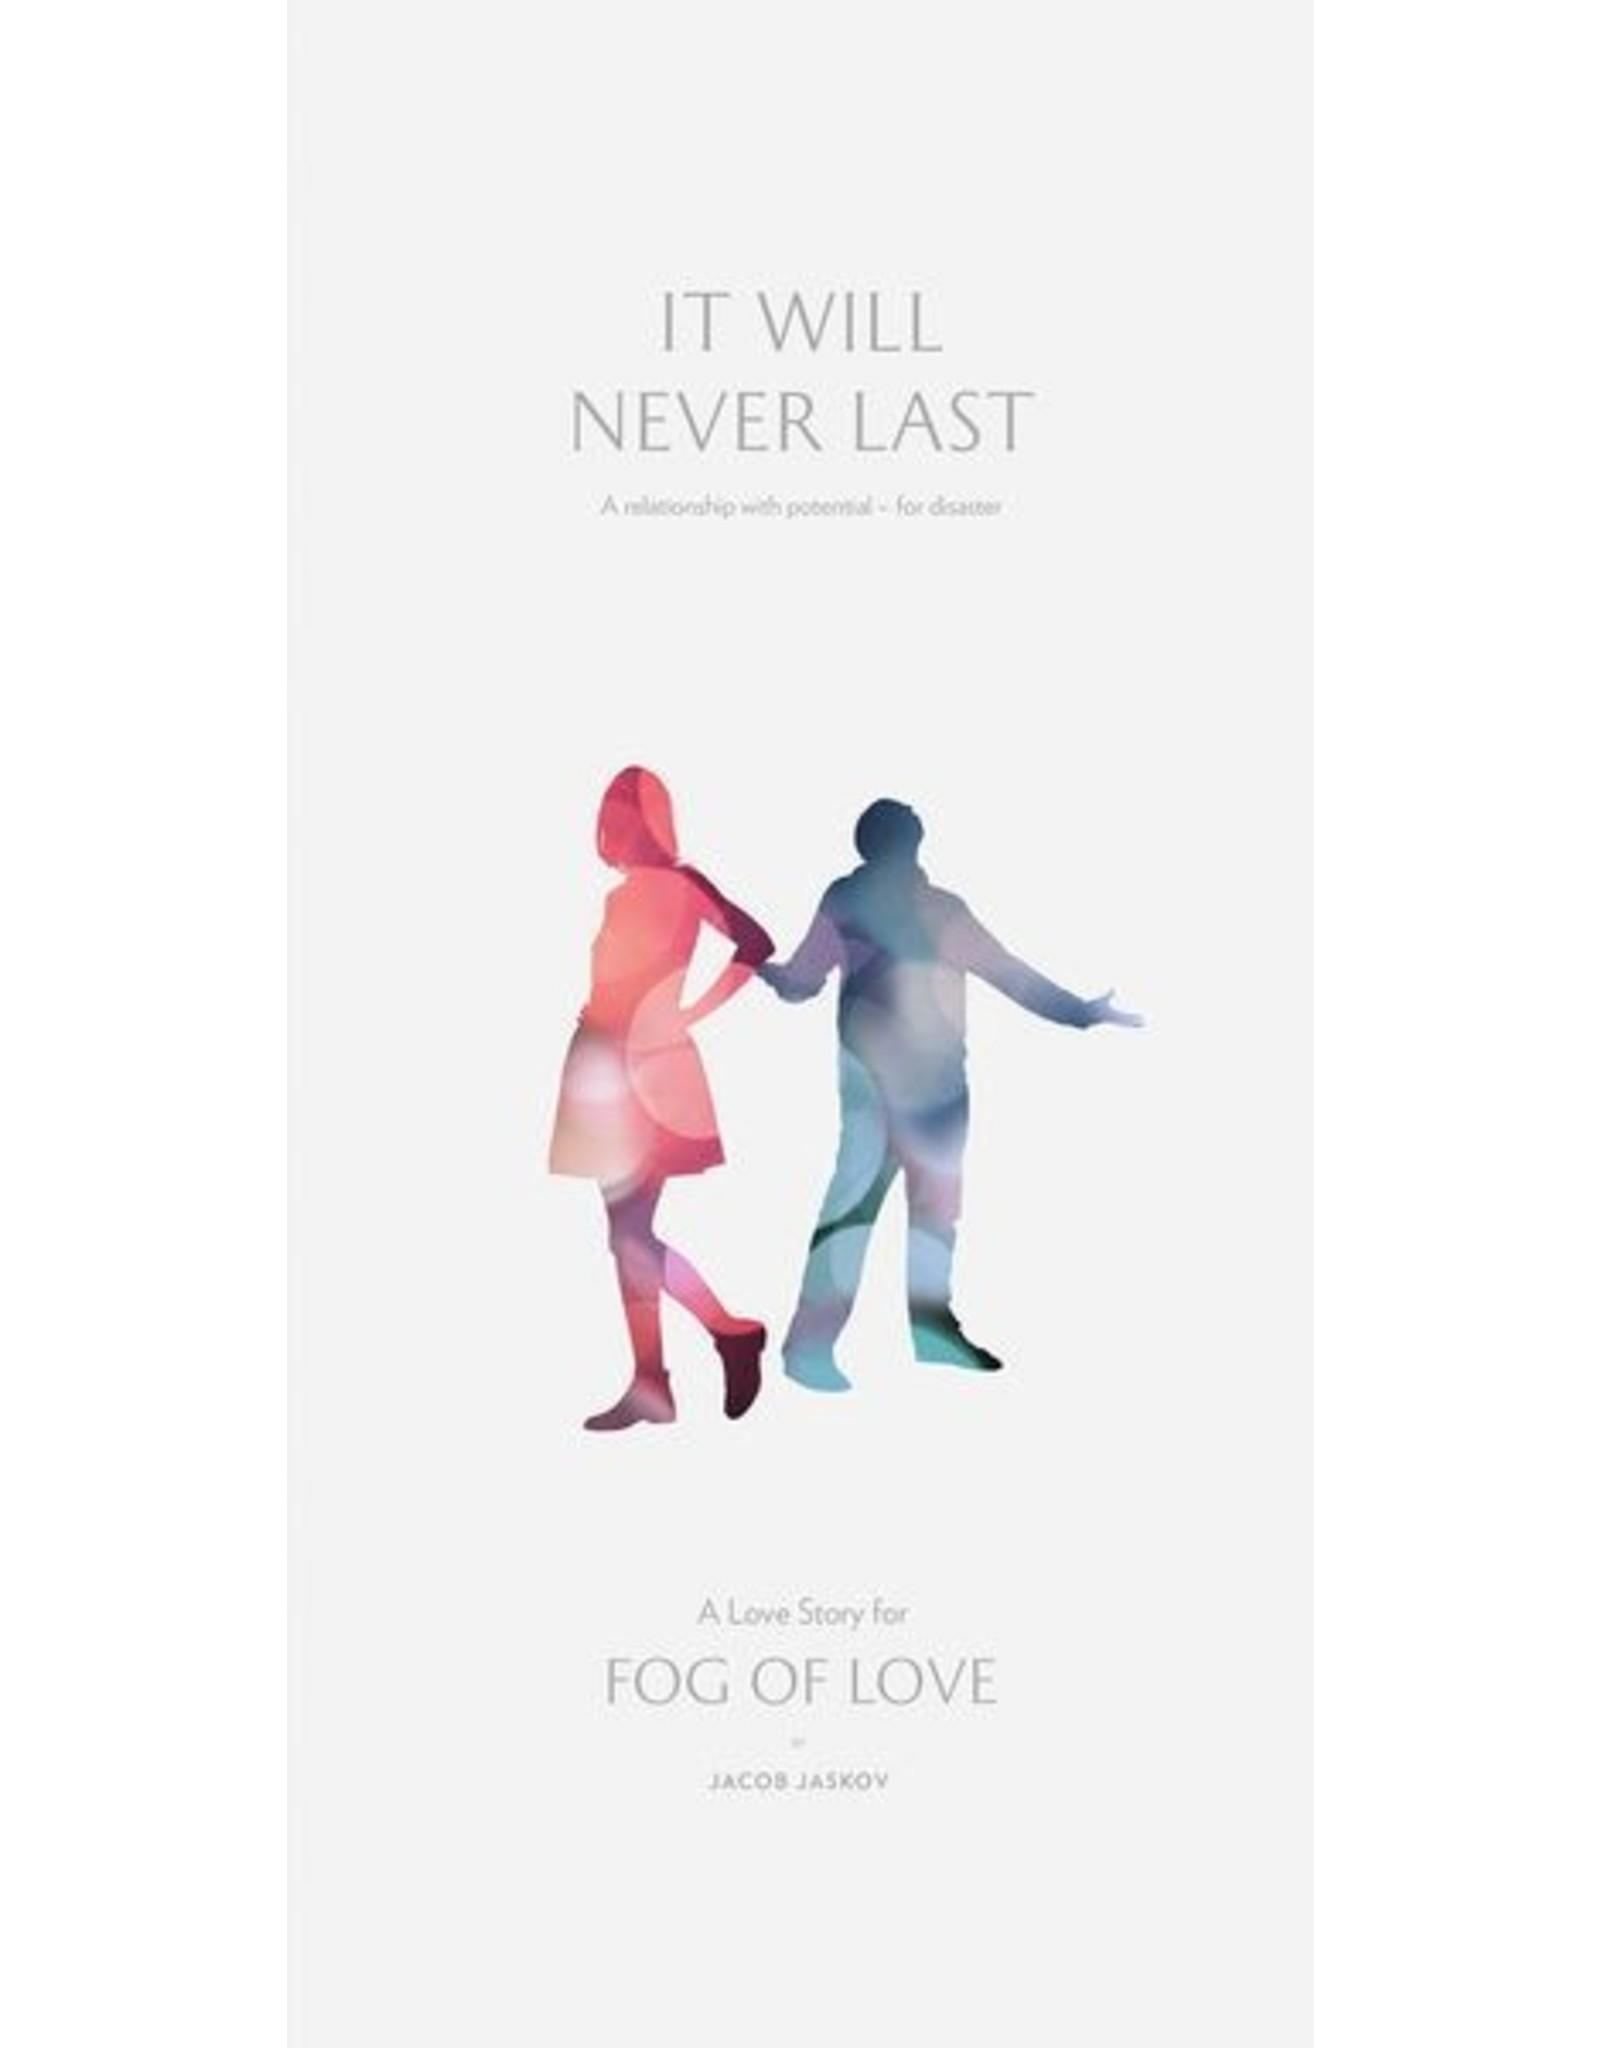 Hush Hush Productions Fog of Love: It Will Never Last